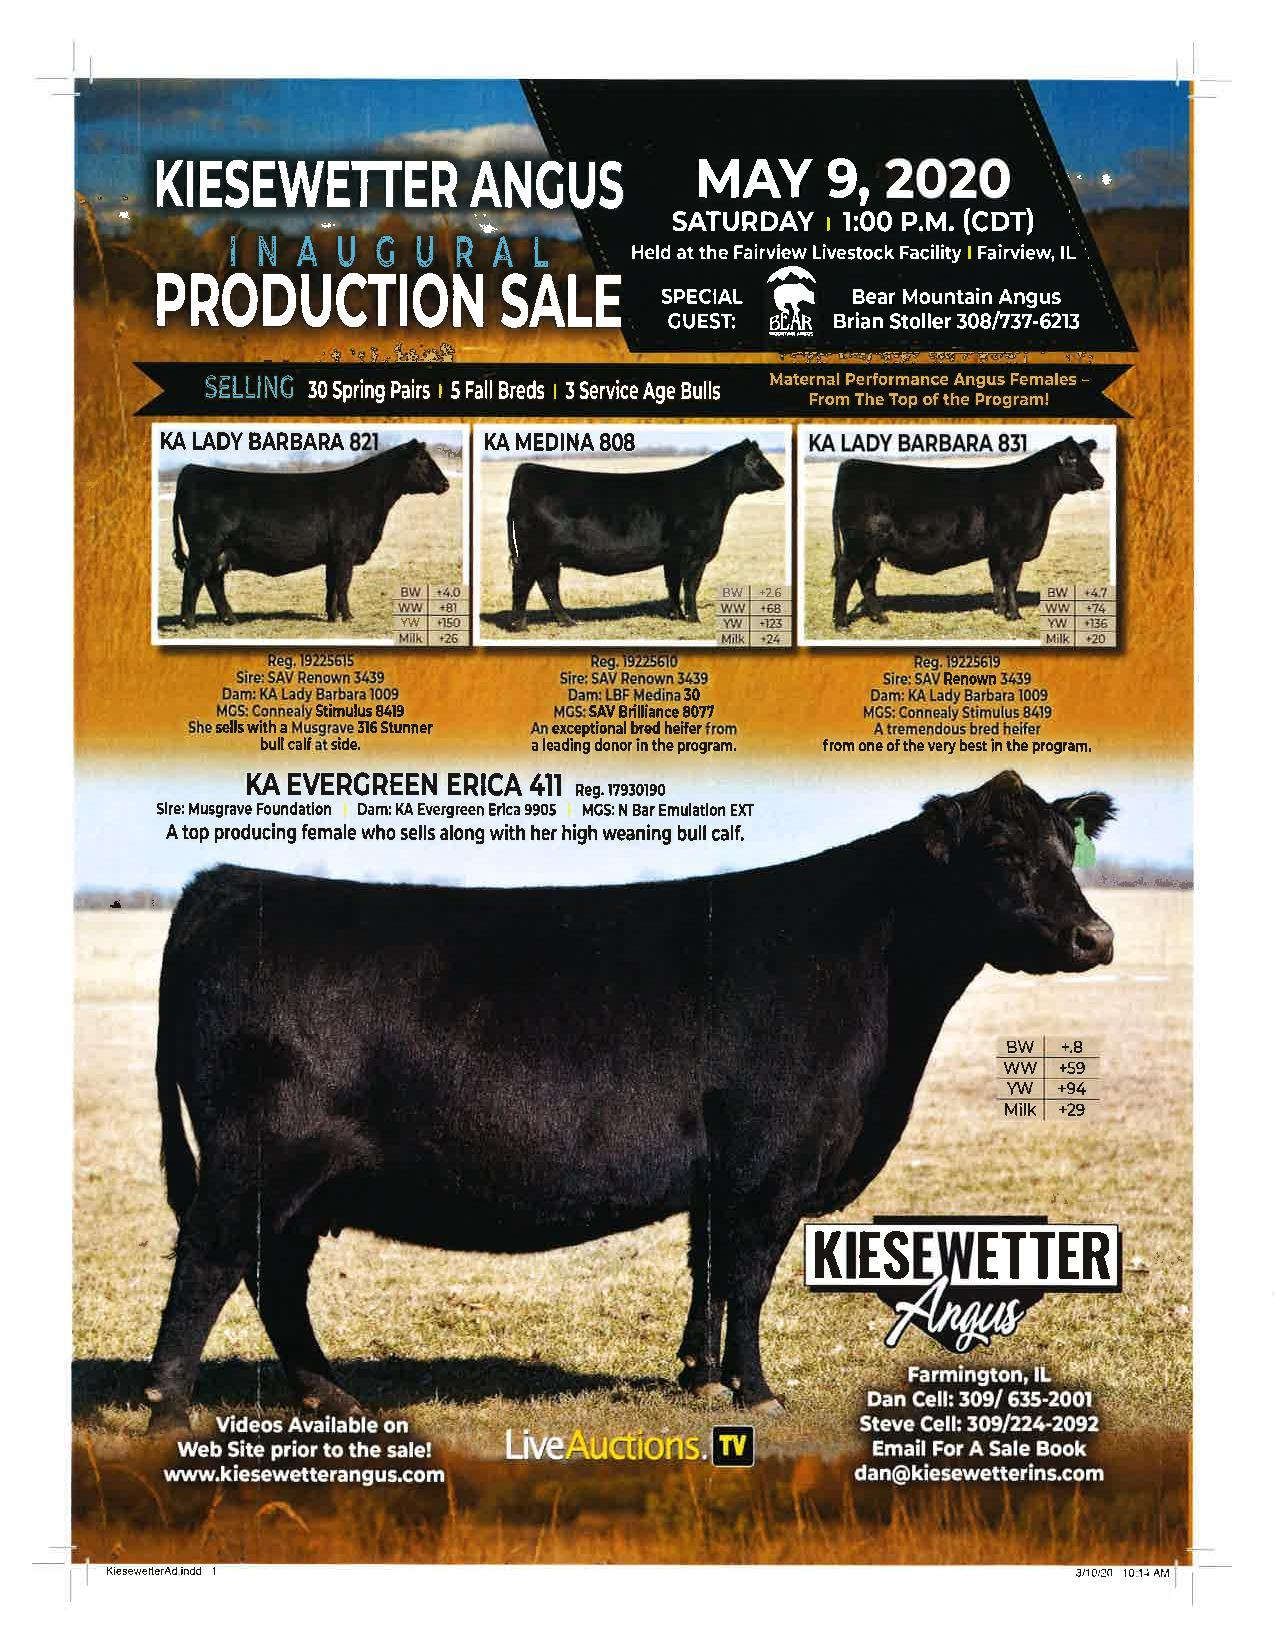 2020 Kiesewetter Angus Inaugural Production Sale